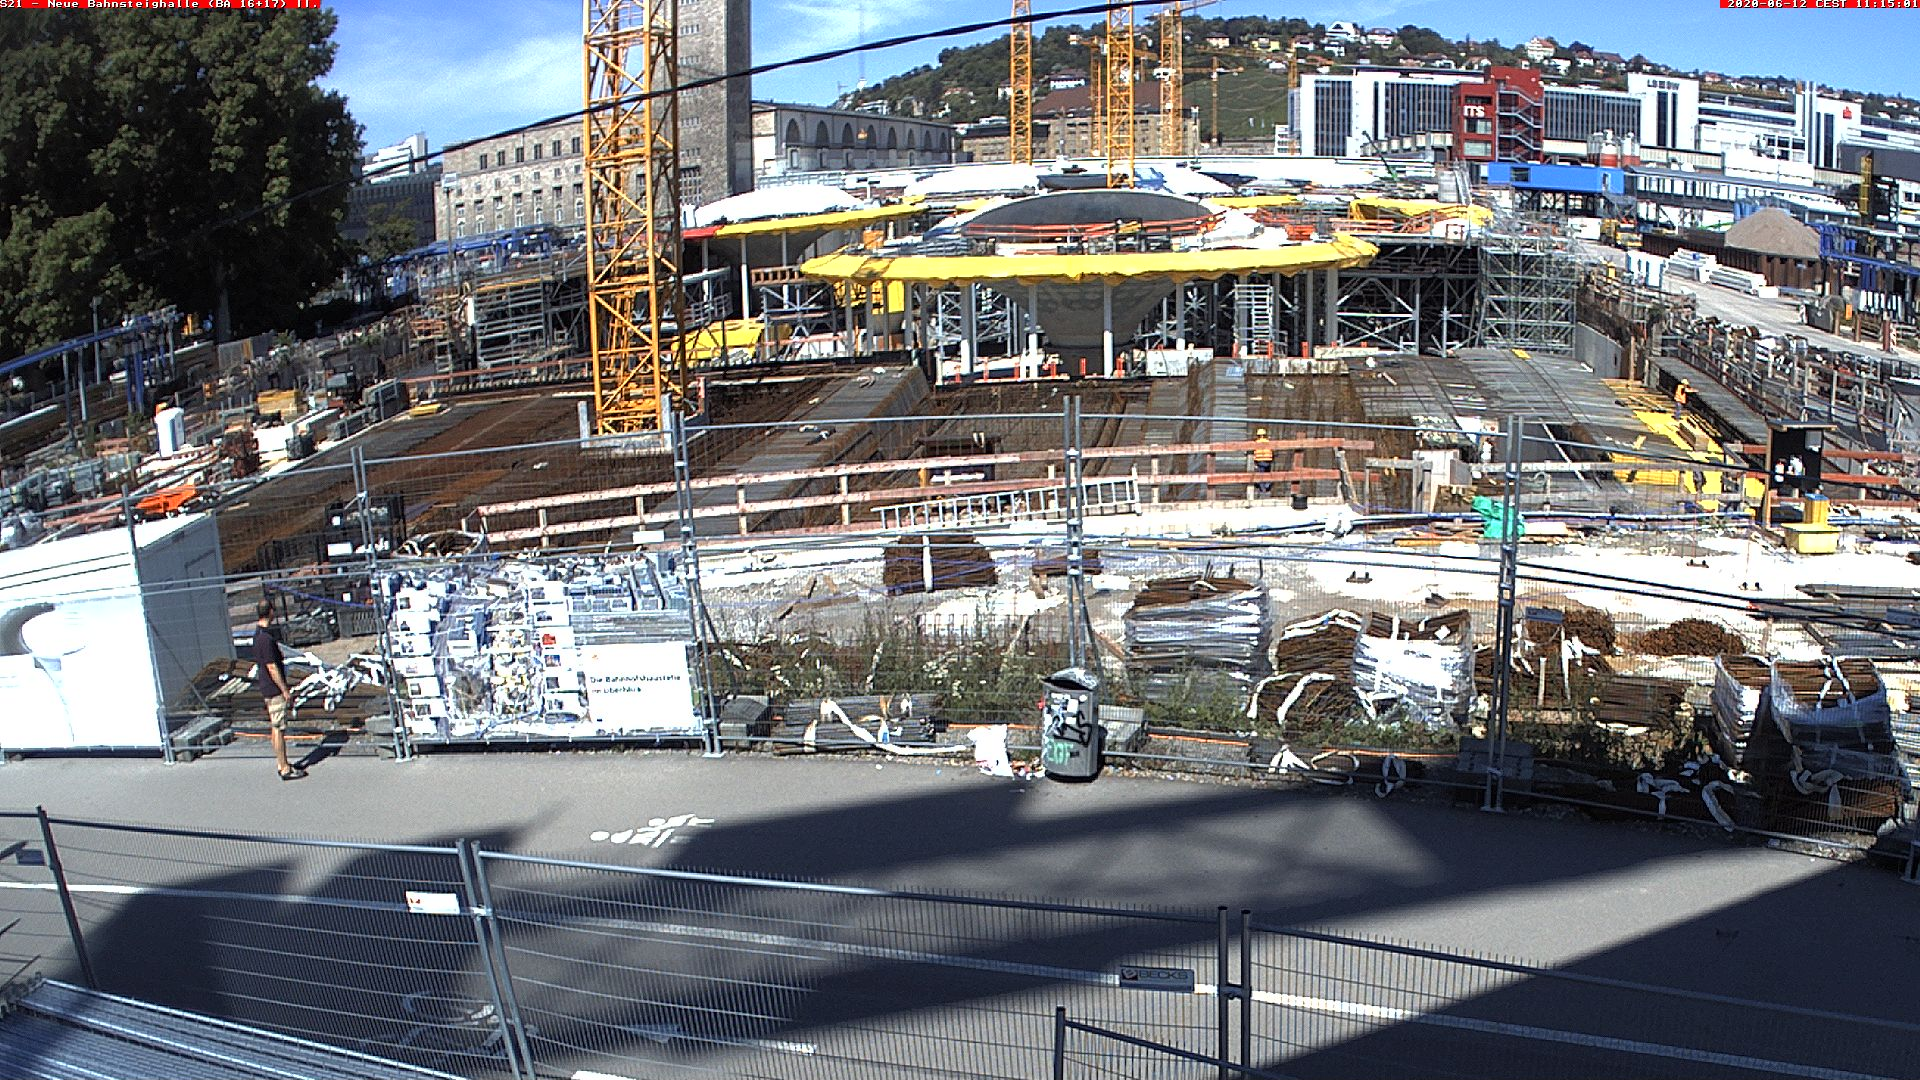 Stuttgart 21: Bauabschnitt 16 (neue Bahnsteighalle)